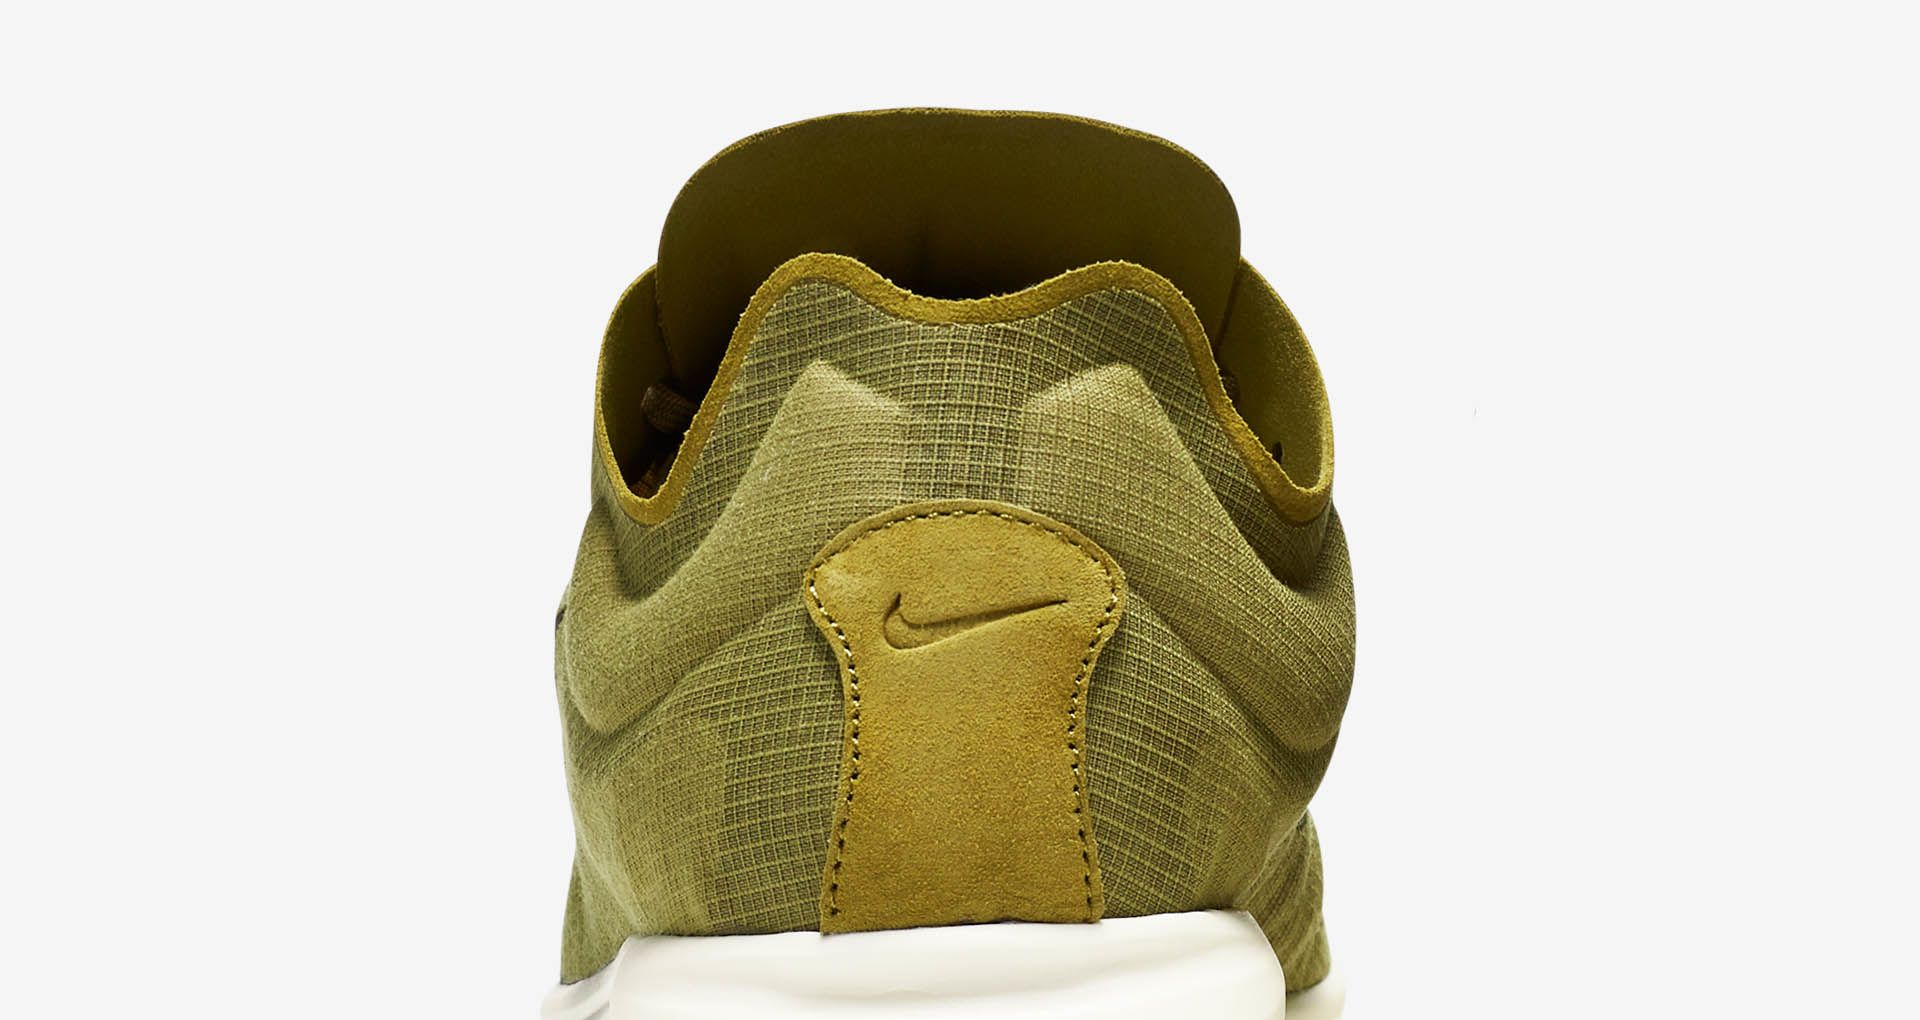 dfcd98e4517 NikeLab Mayfly Lite  Camper Green . Nike+ SNKRS